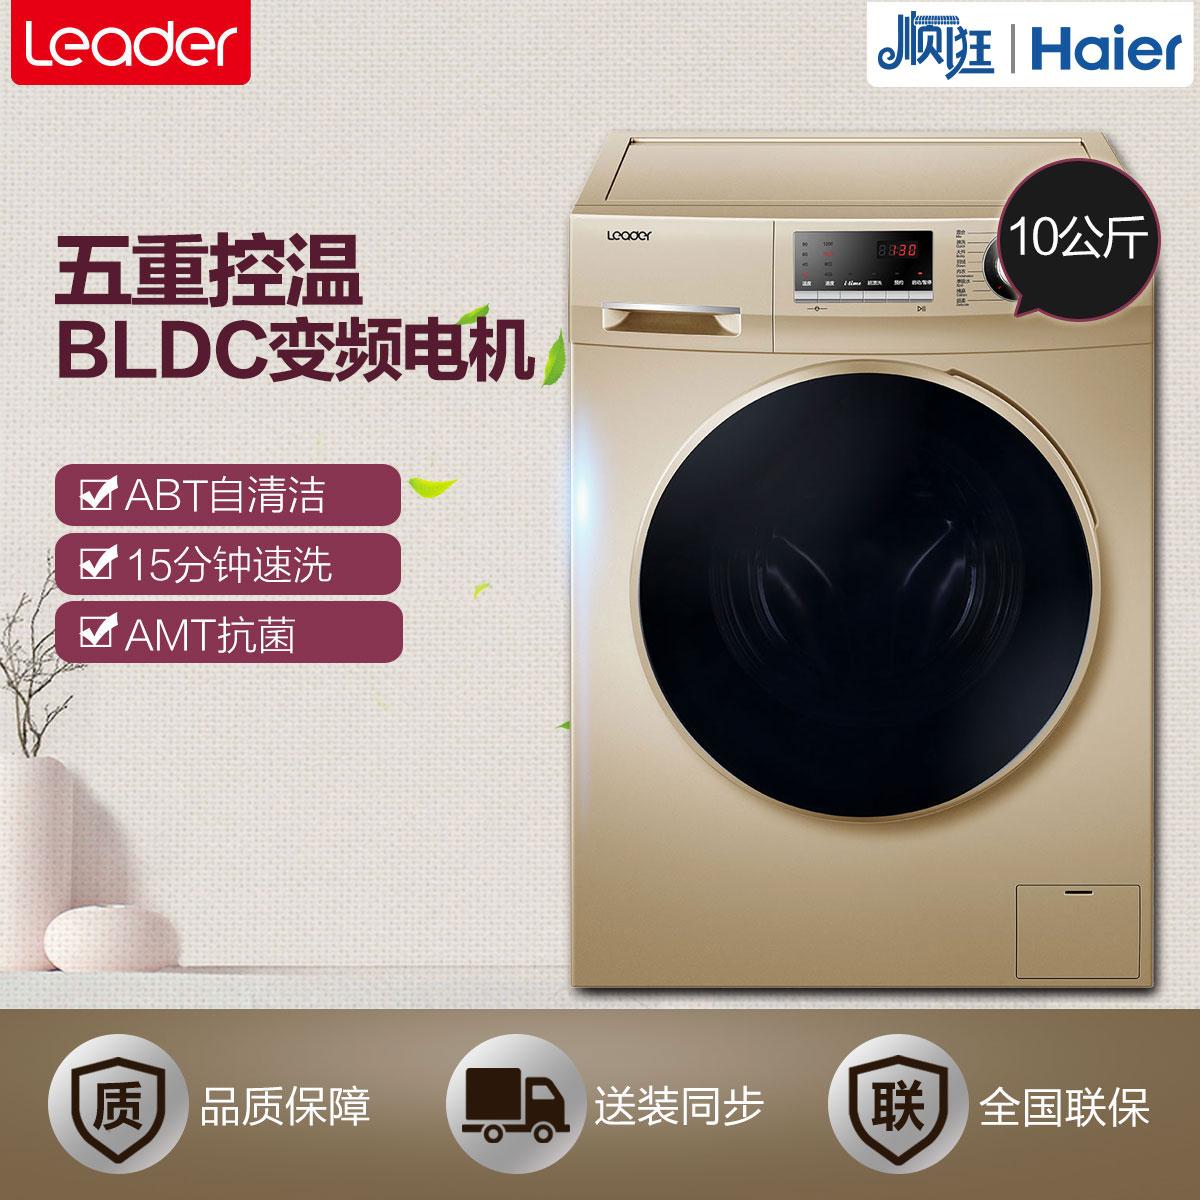 BLDC变频电机 I-TIME自由洗 @G1012BX66G 10kg大容量变频滚筒全自动洗衣机